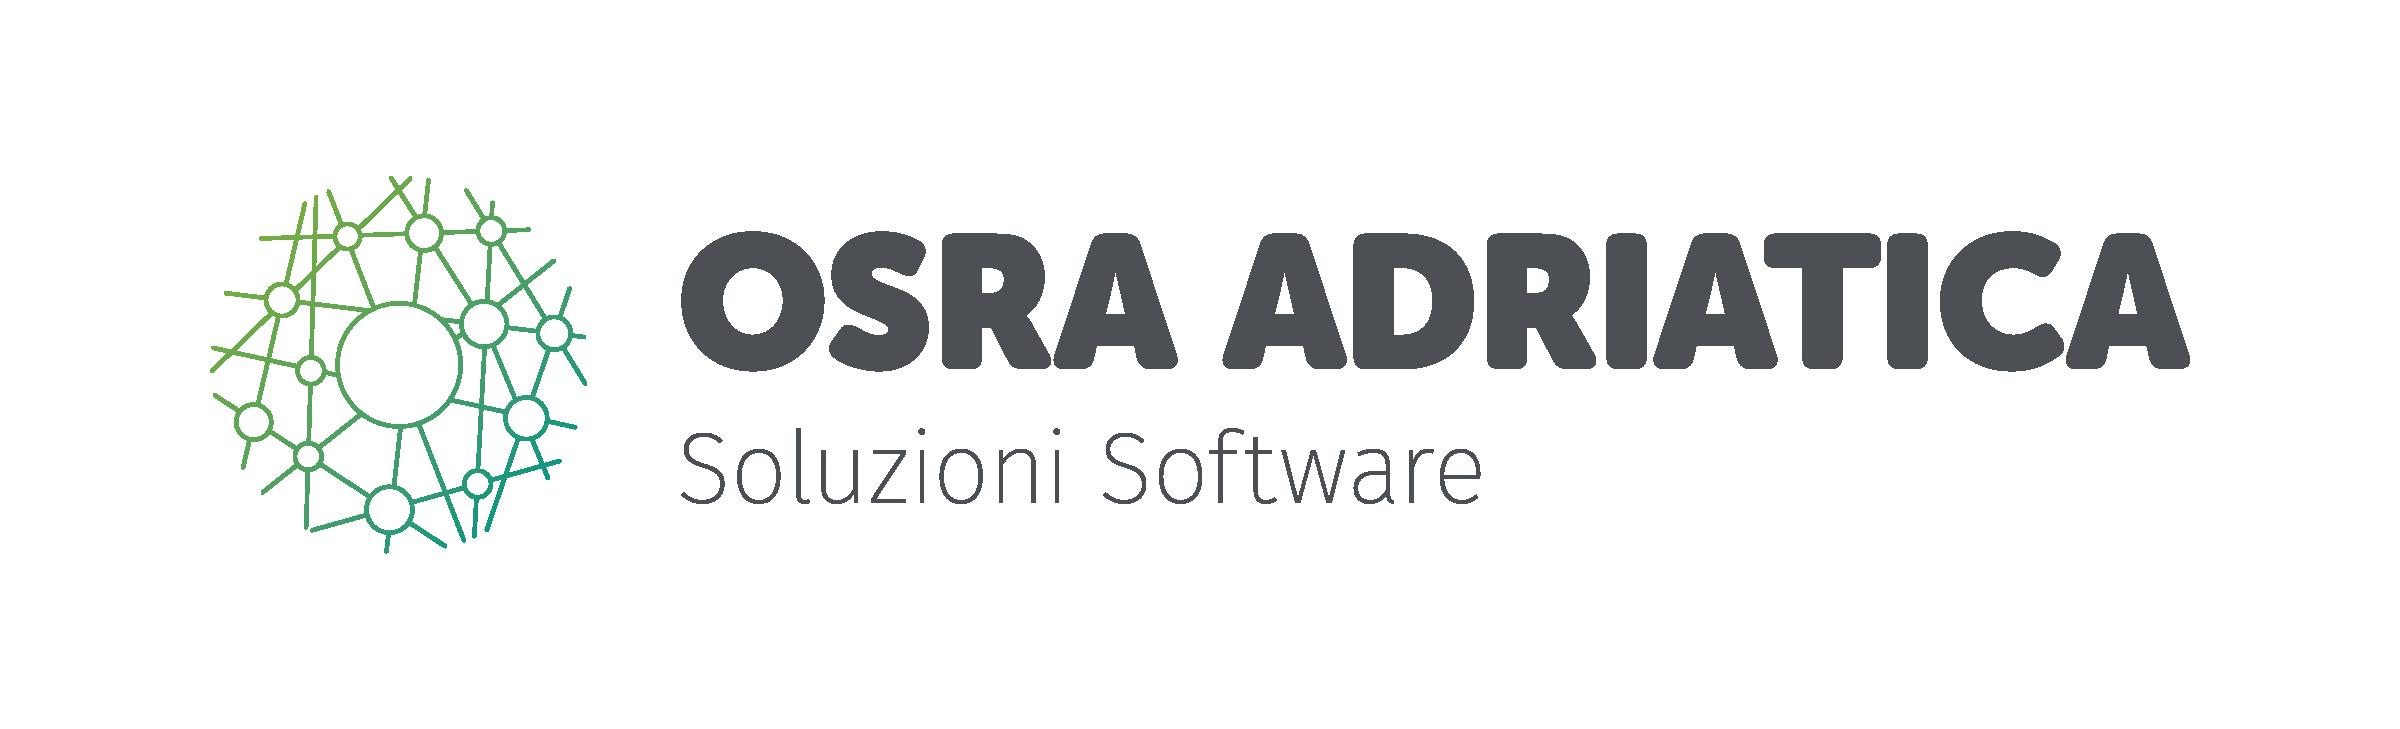 20180628_Osra_Logo_v3_high_transp